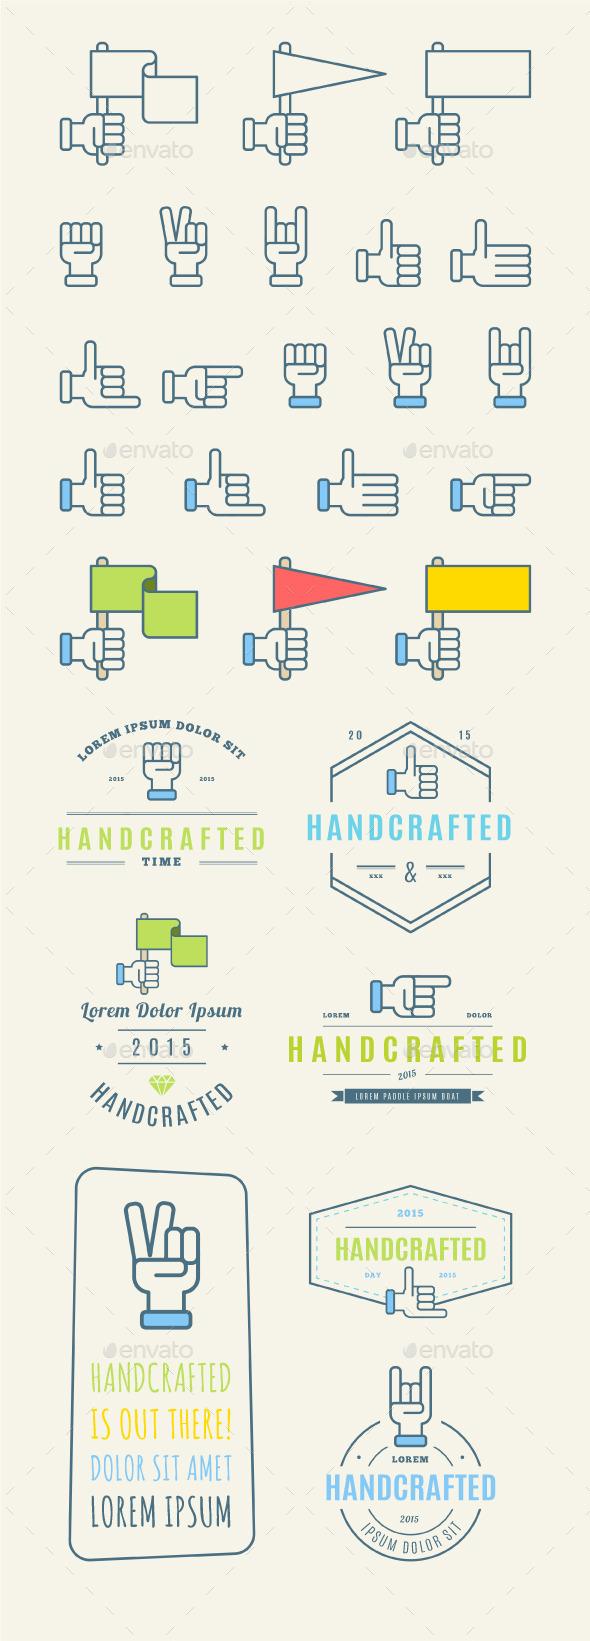 Trendy Retro Vintage Insignias and Logo - Miscellaneous Vectors